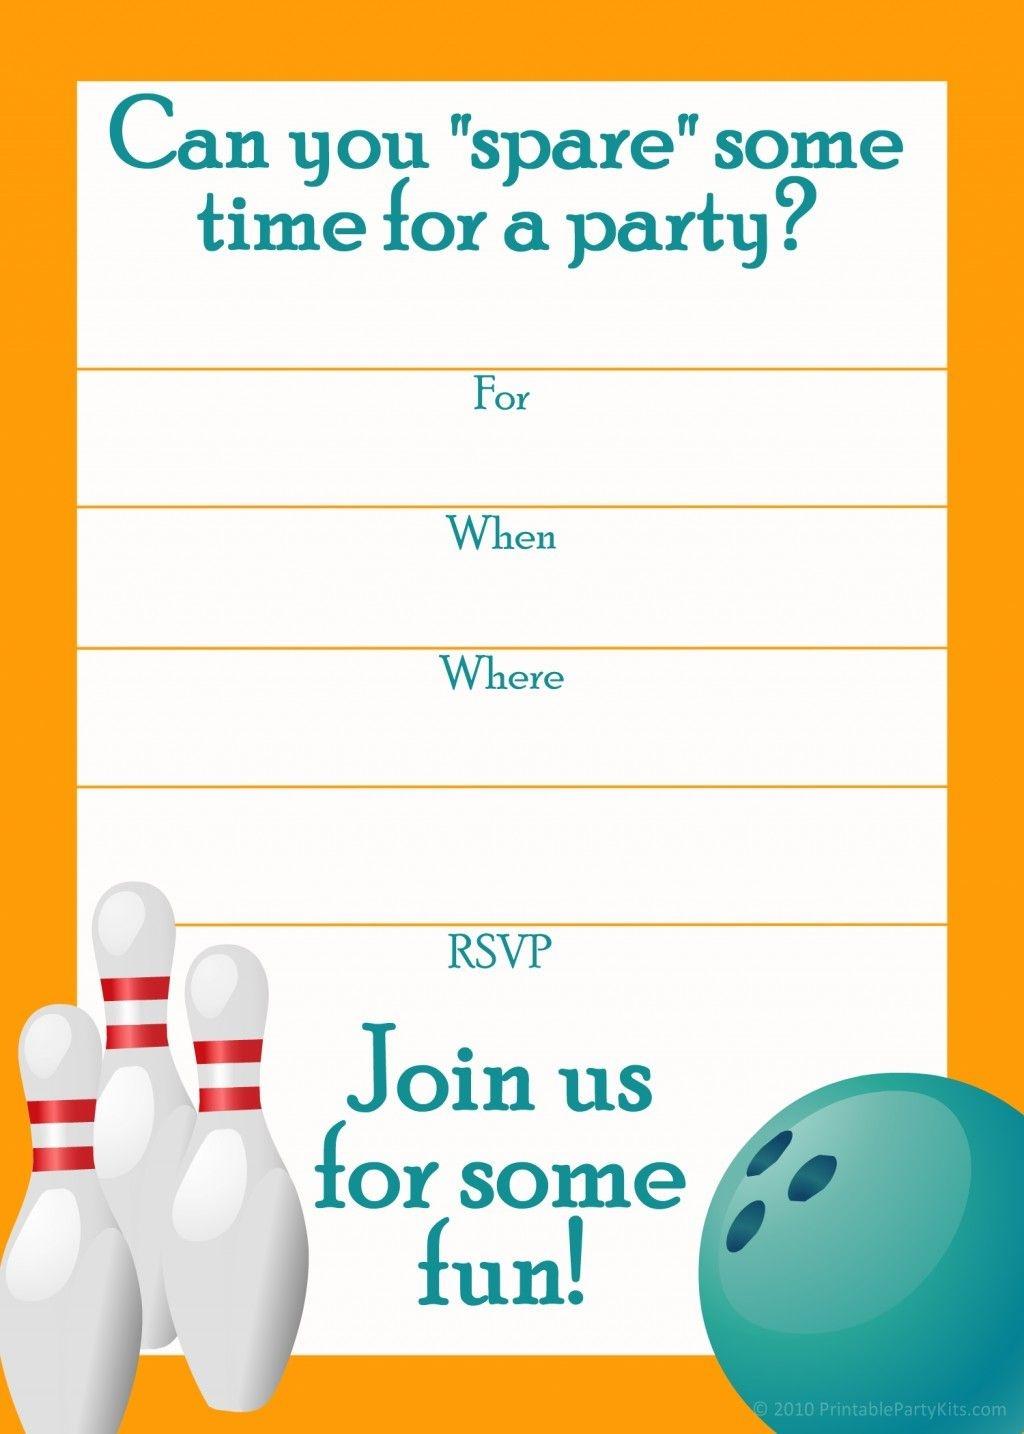 Free Printable Sports Birthday Party Invitations Templates   Dakota - Free Printable Bowling Invitation Templates